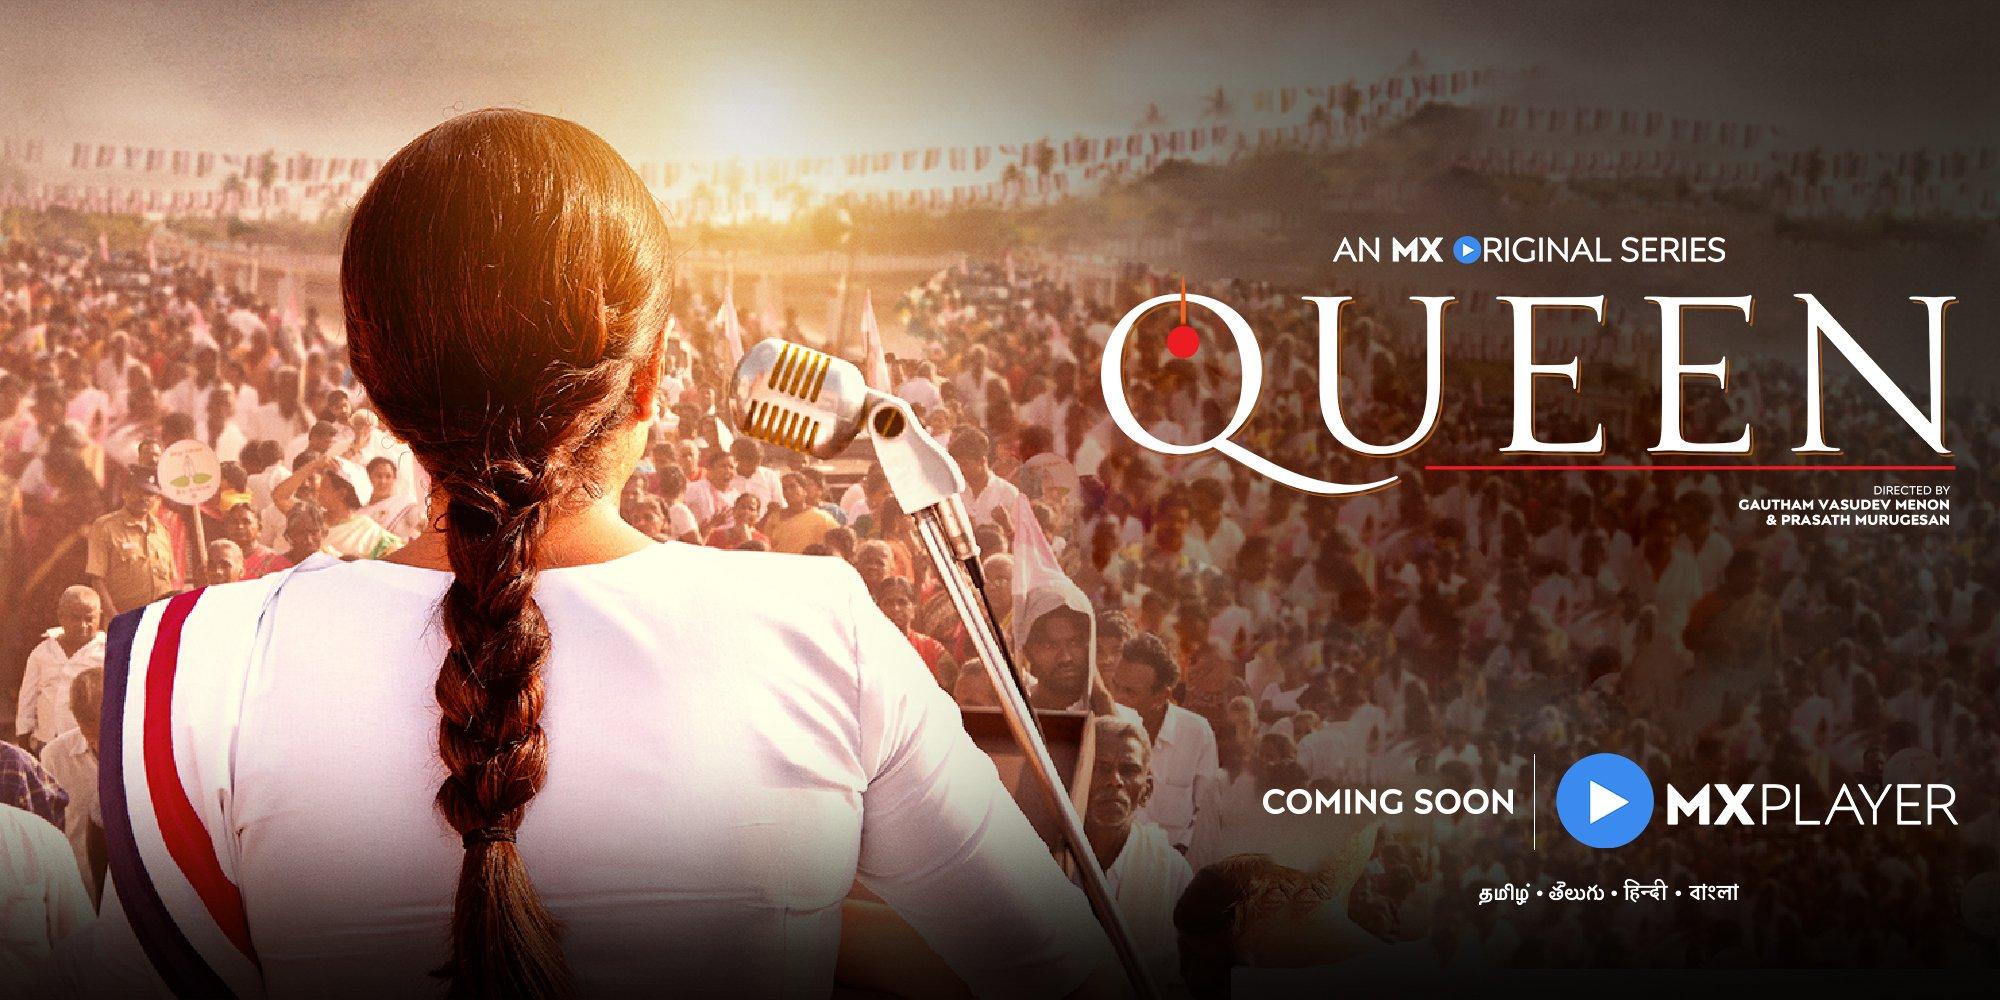 Actress Ramya Krishnan plays Jayalalithaa Biopic Queen Web Series by MX Player